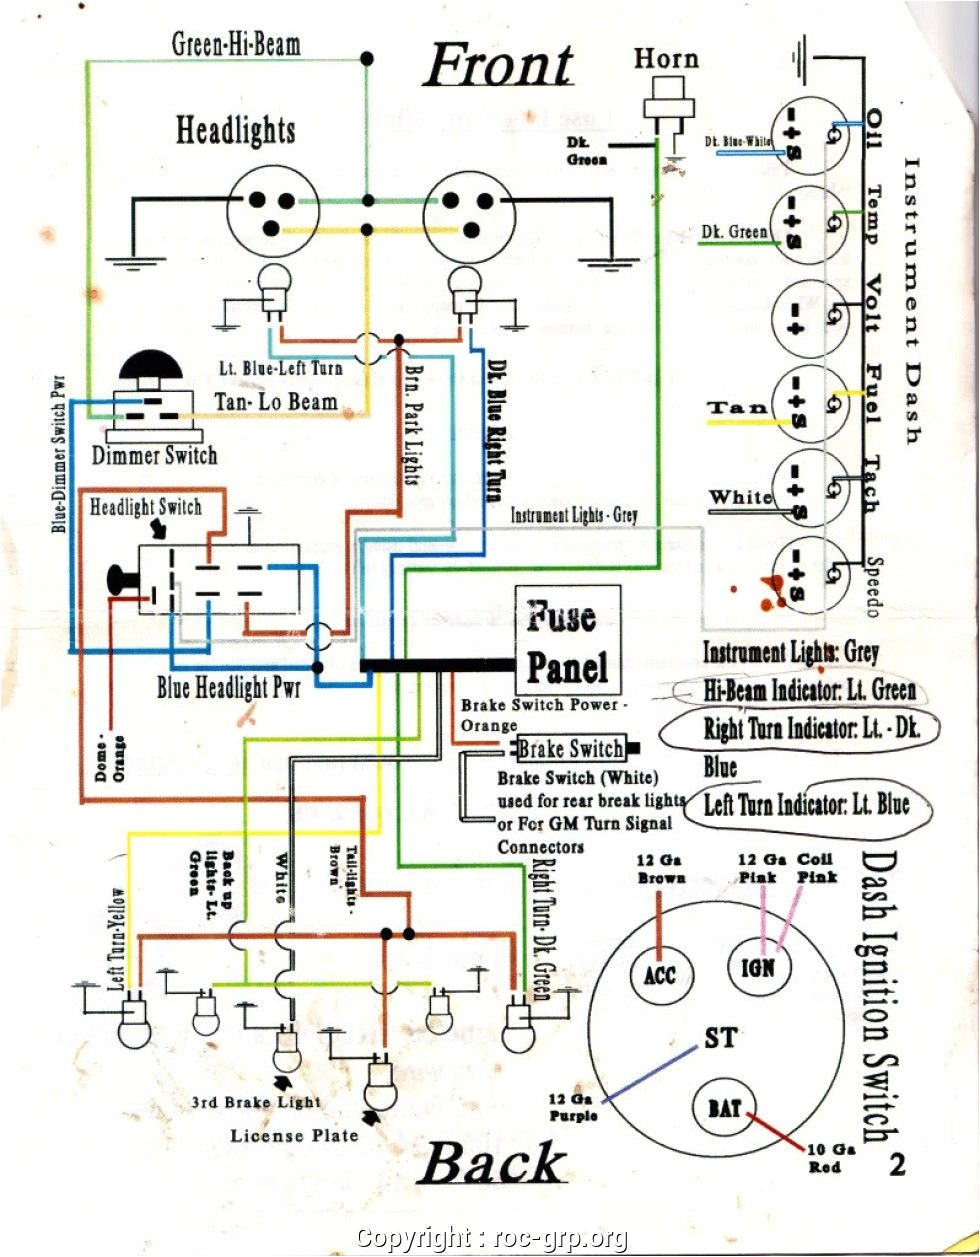 help ez wiring harness diagrams wiring diagram database ez wire wiring harness diagram new wiring diagram